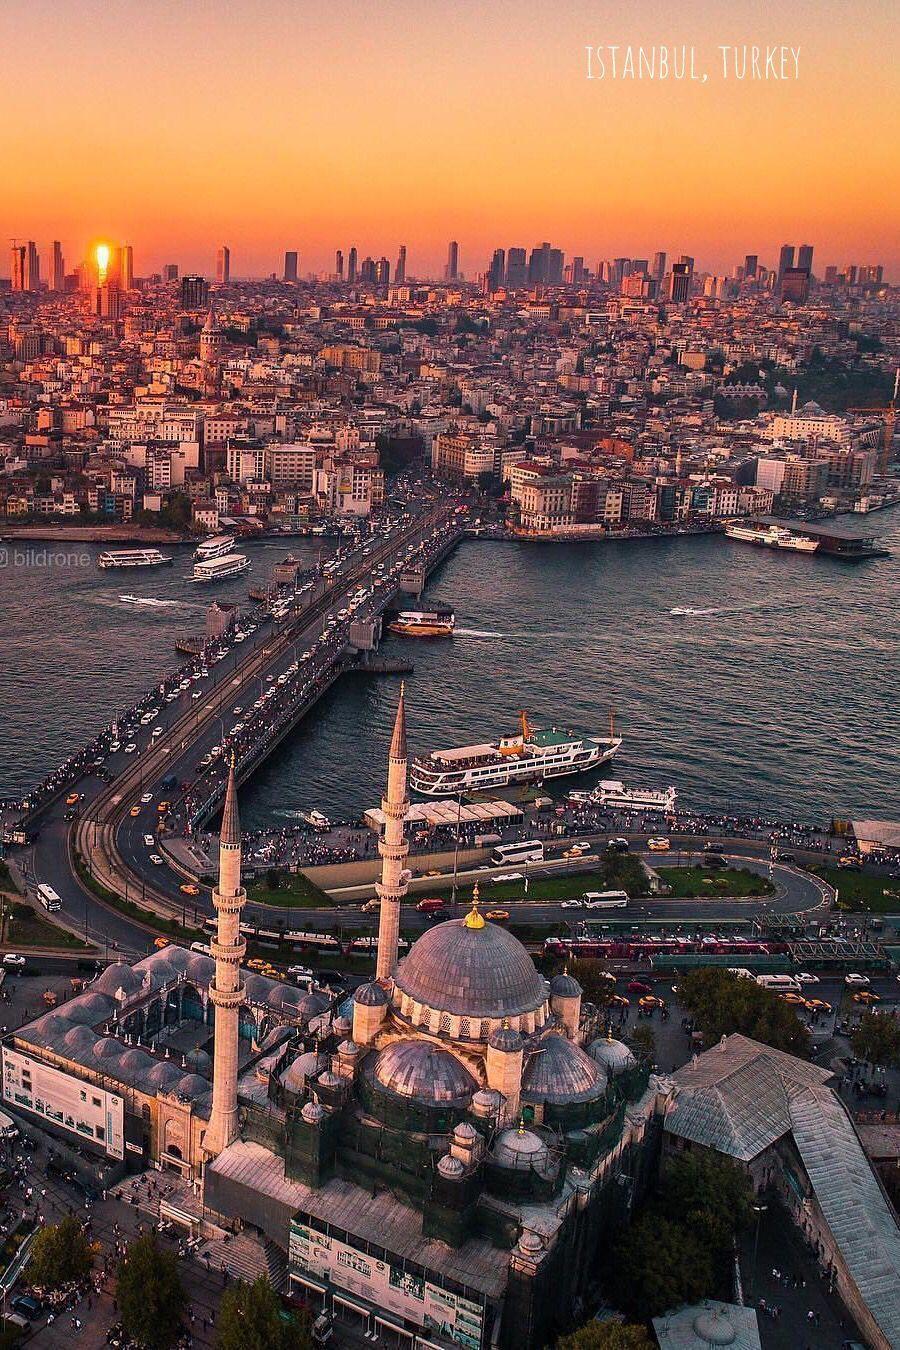 Pin By Joao Leal On Estanbul Turkia In 2020 Istanbul Turkey Photography Istanbul Turkey Istanbul Photography